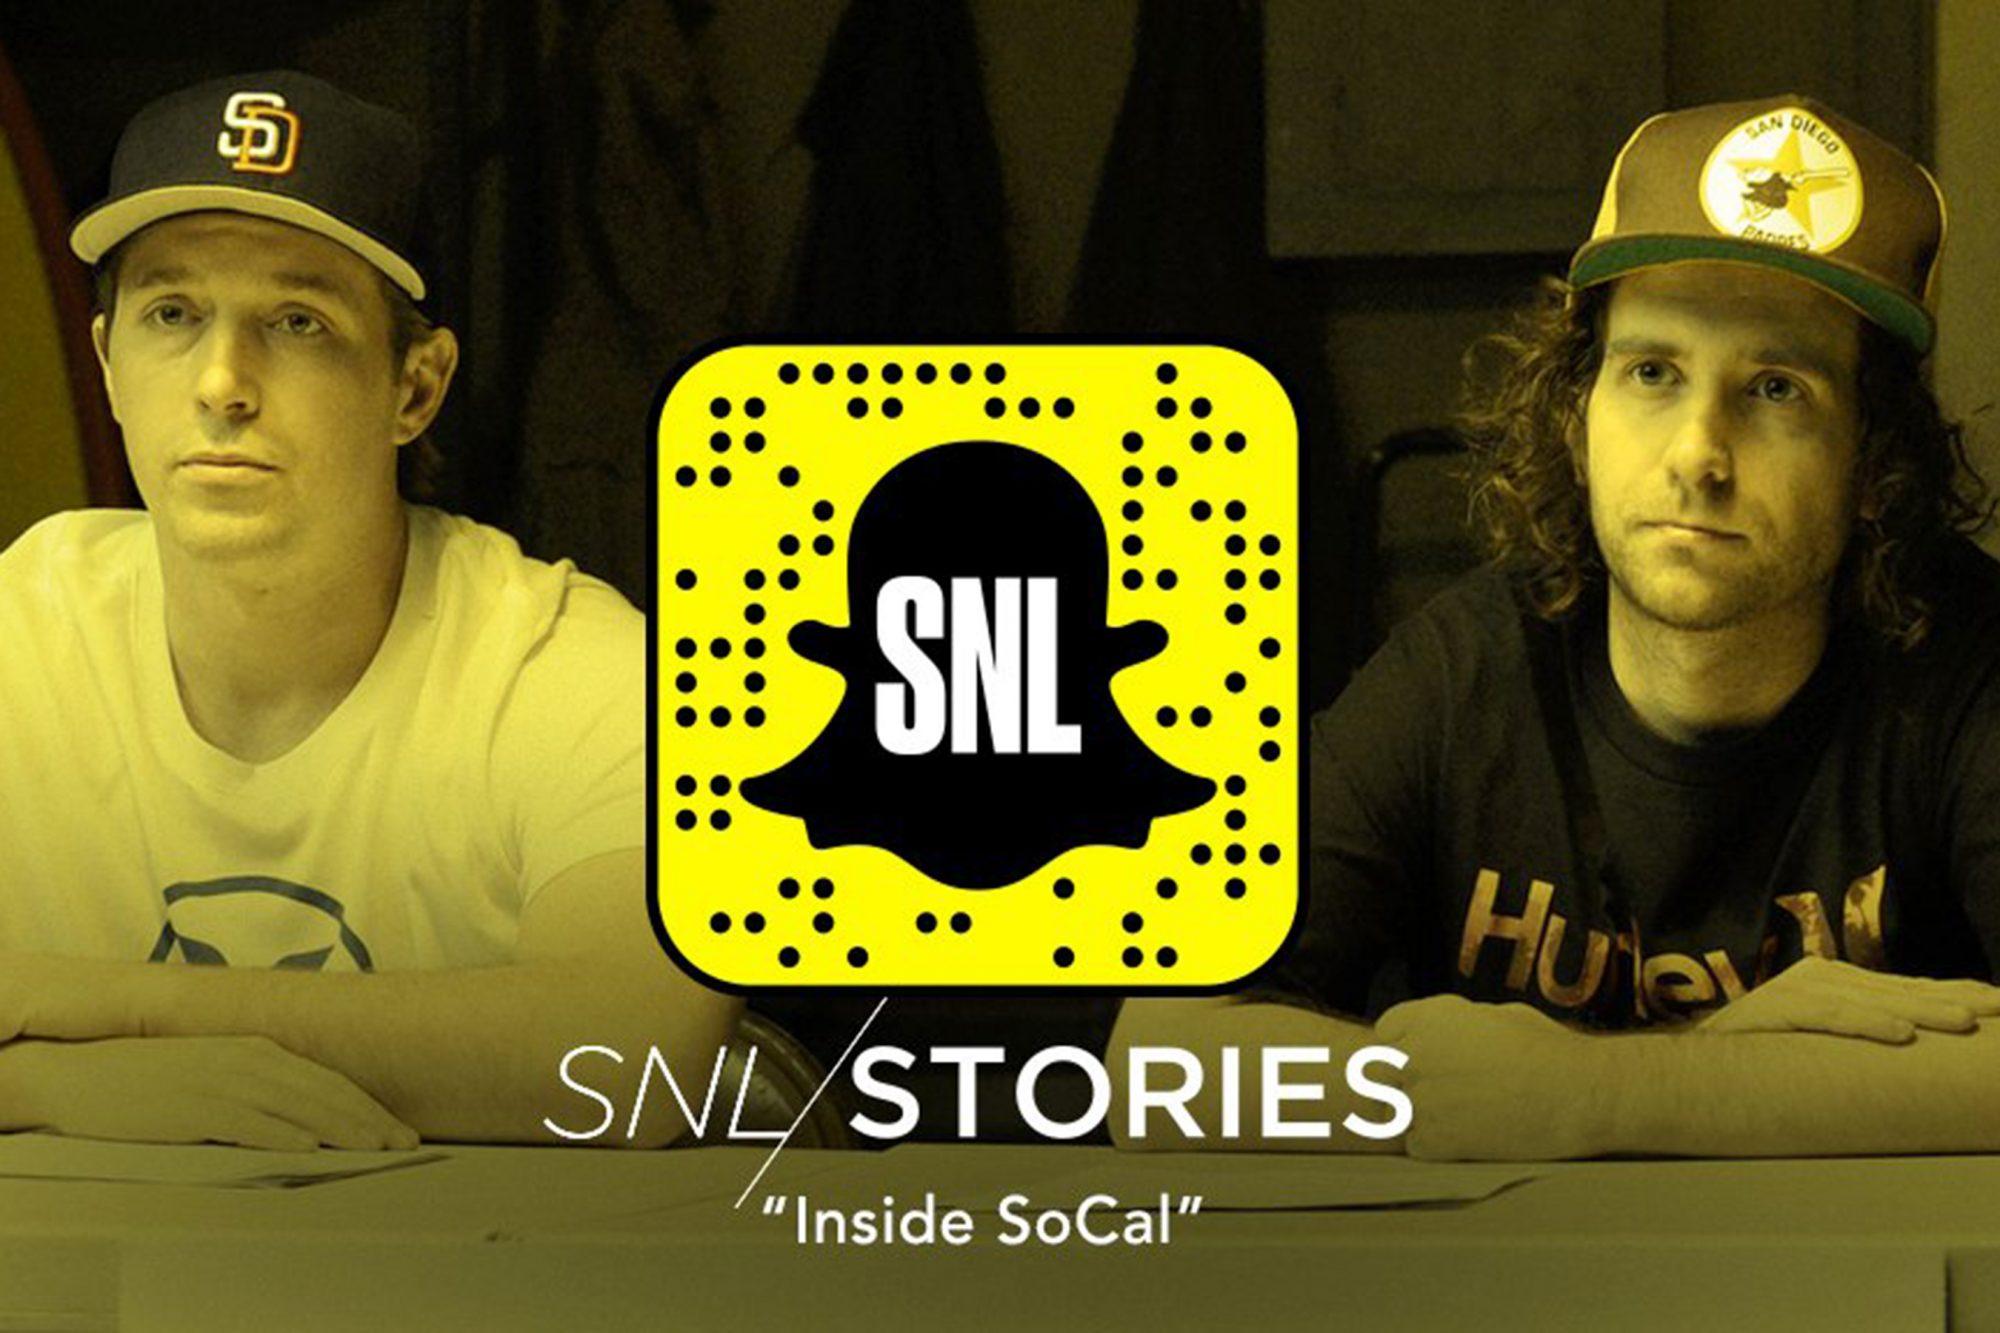 Inside Socal on SNL Snapchat Stories